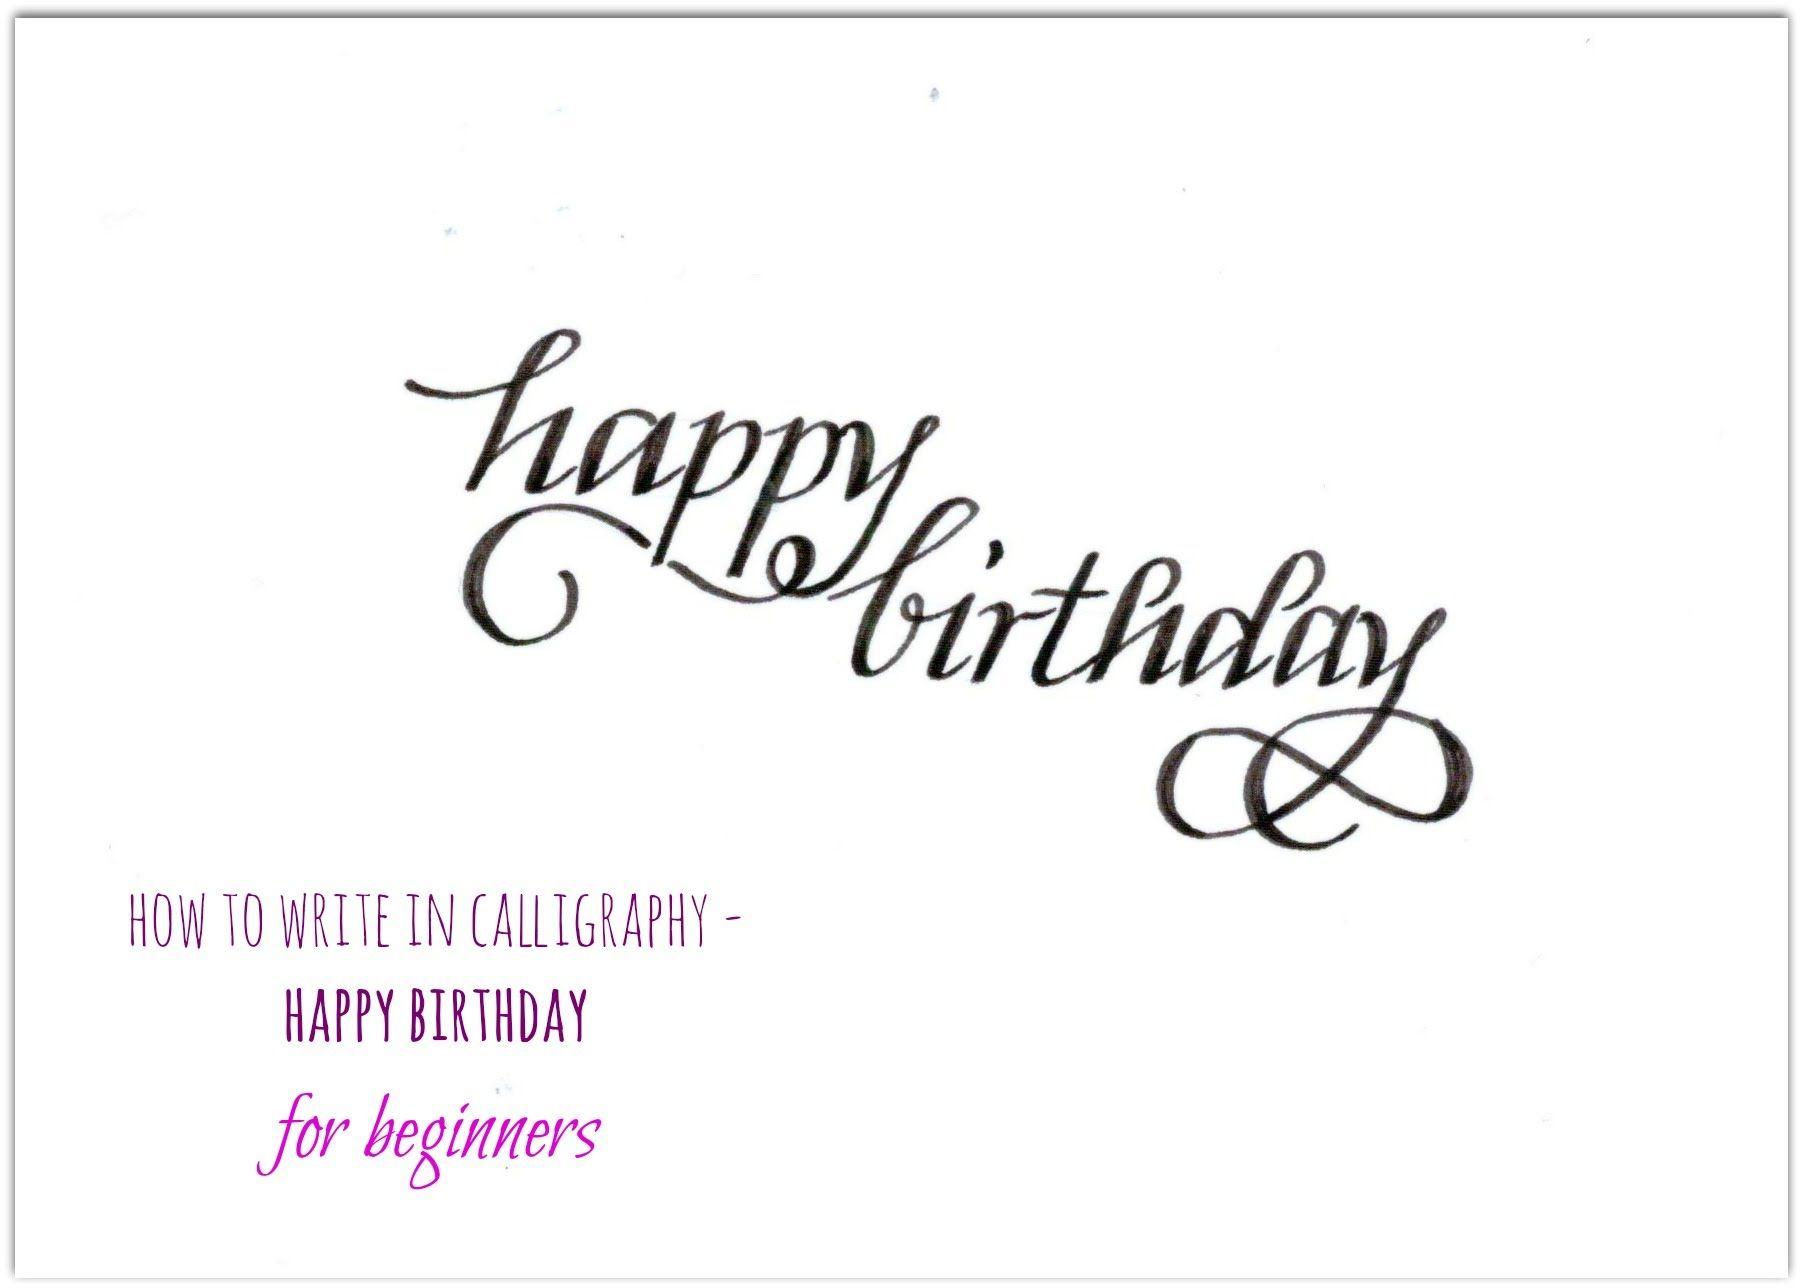 Cursive Writing Happy Birthday Wishes Calligraphy